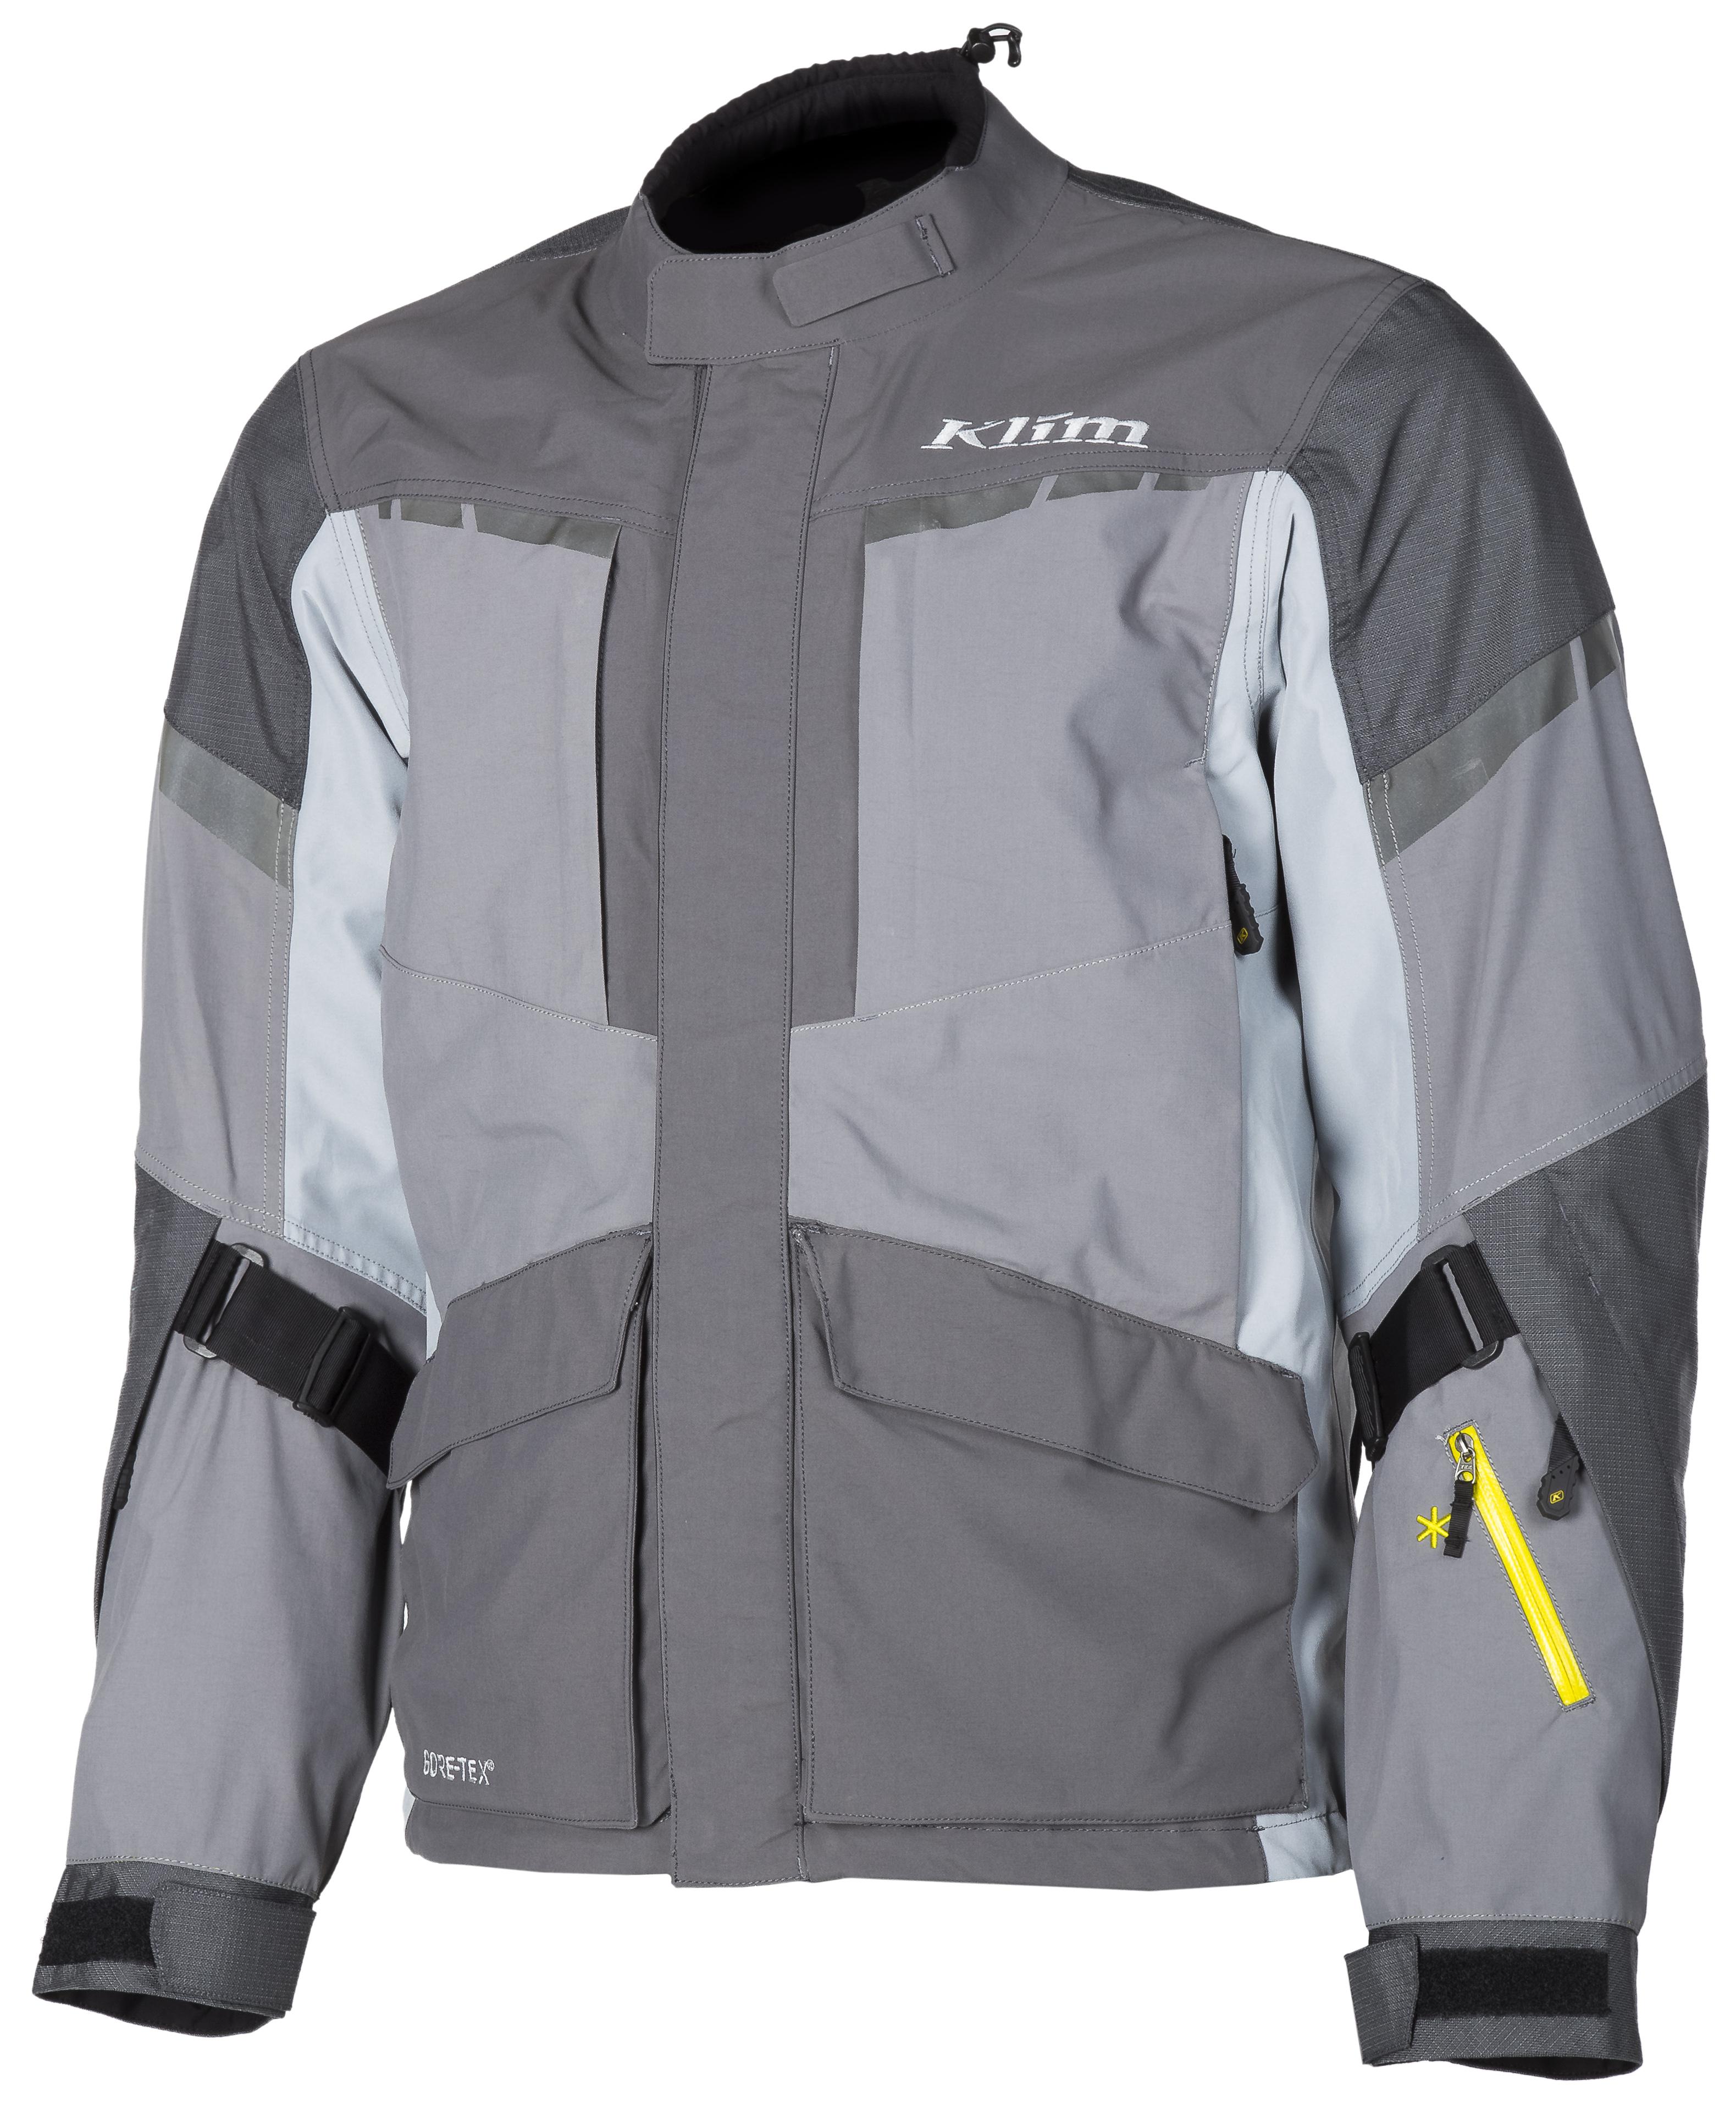 3906-000-600 Carlsbad Jacket